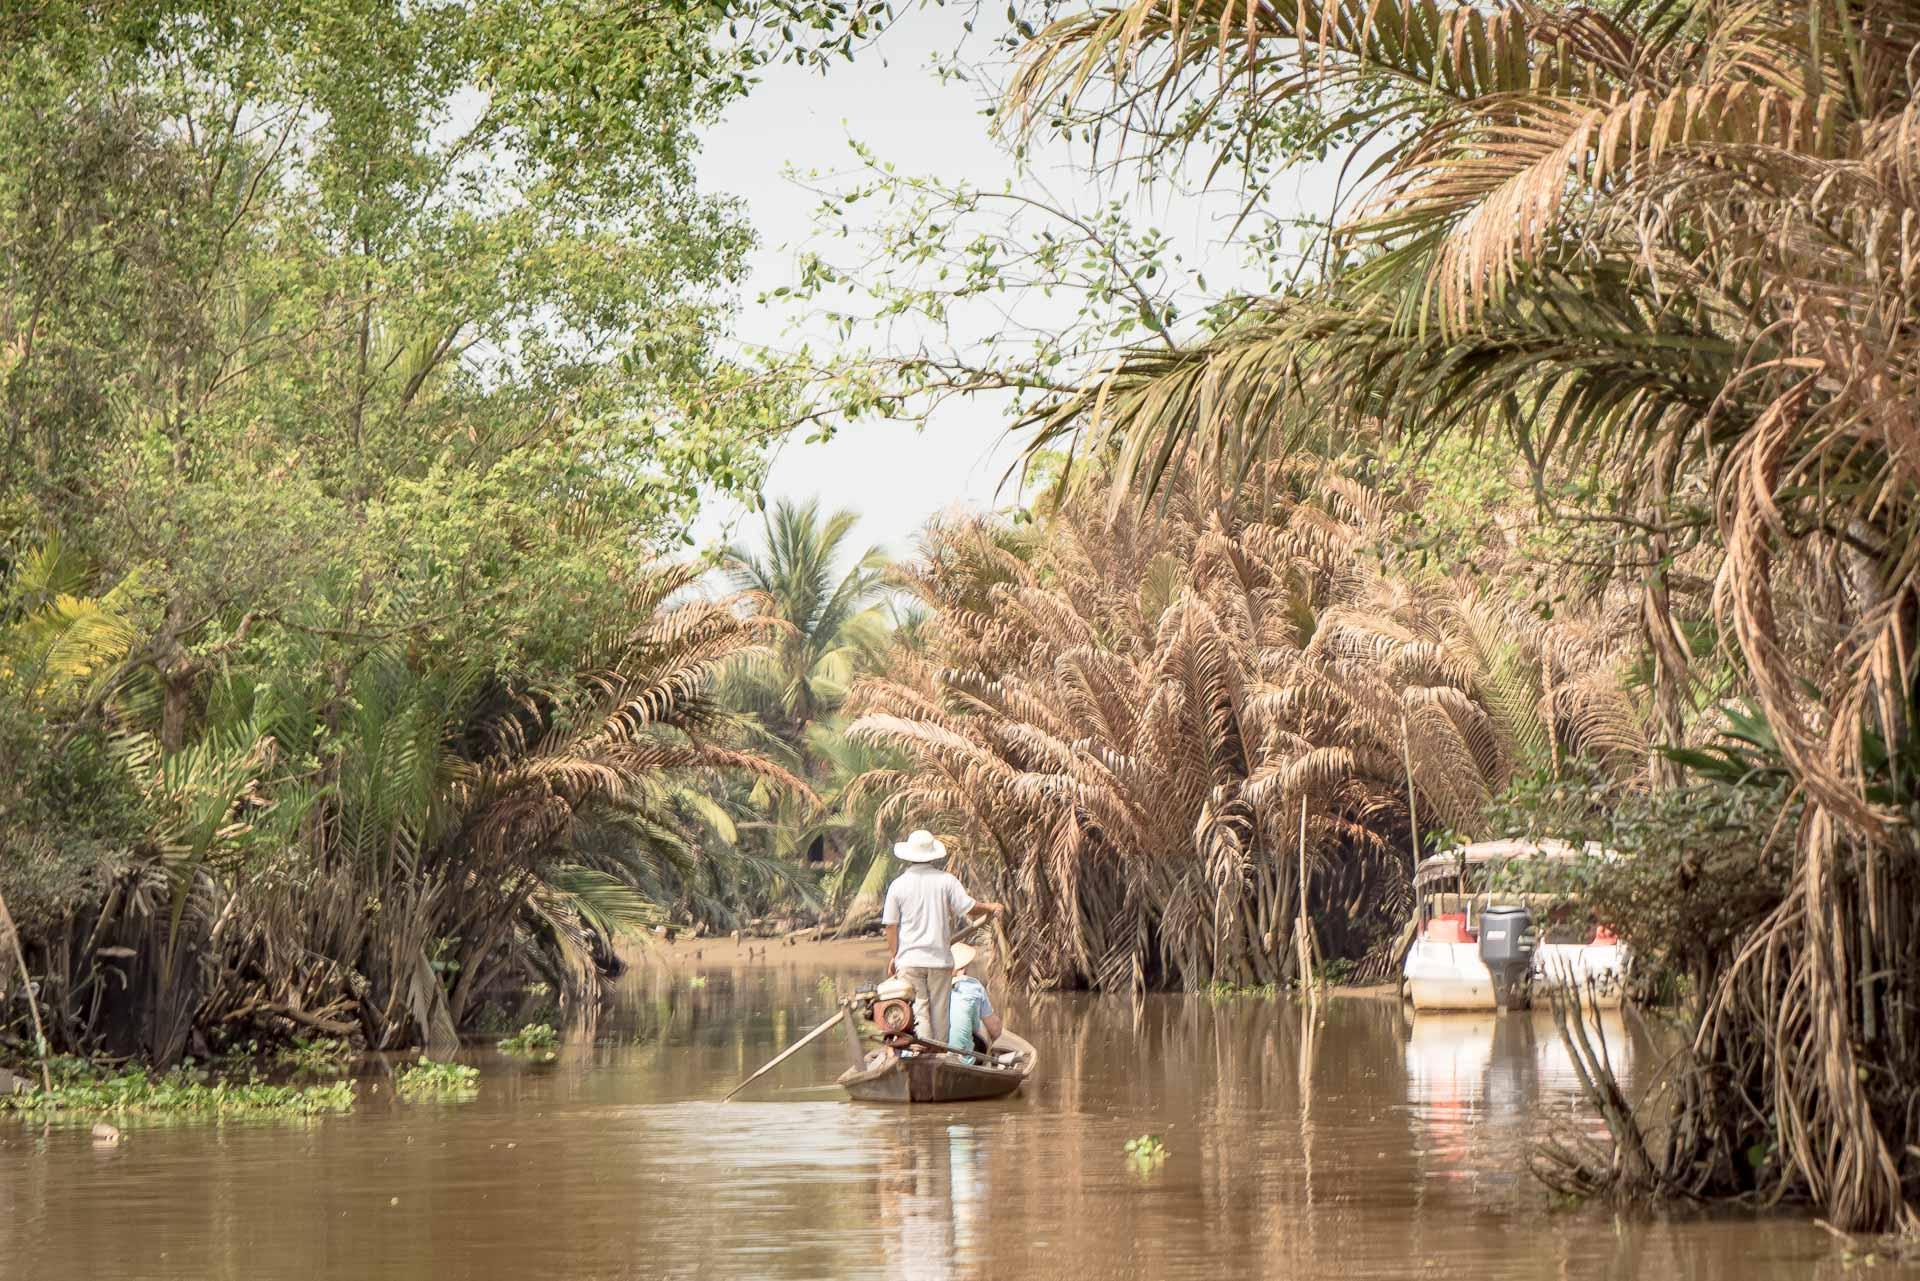 Lesvoyageuses-Vietnam-Saigon-Delta-Mekong-Les-Rives--38